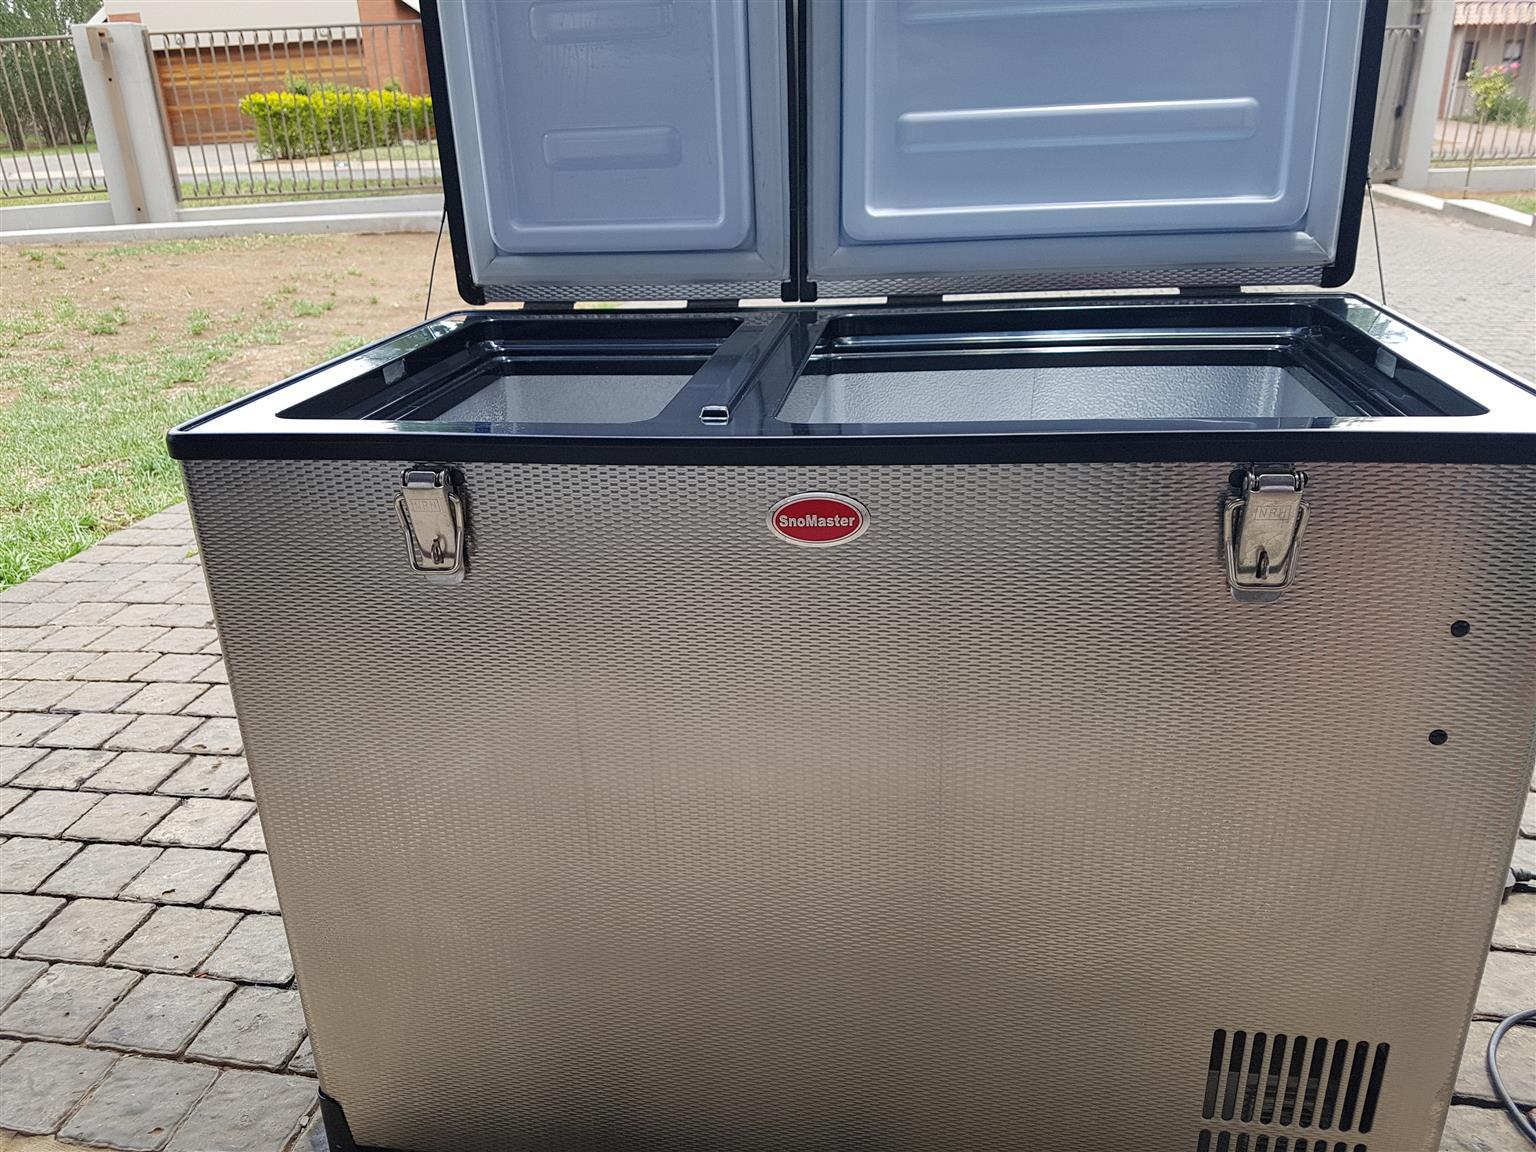 Snomaster Fridge Freezer 85L | Junk Mail